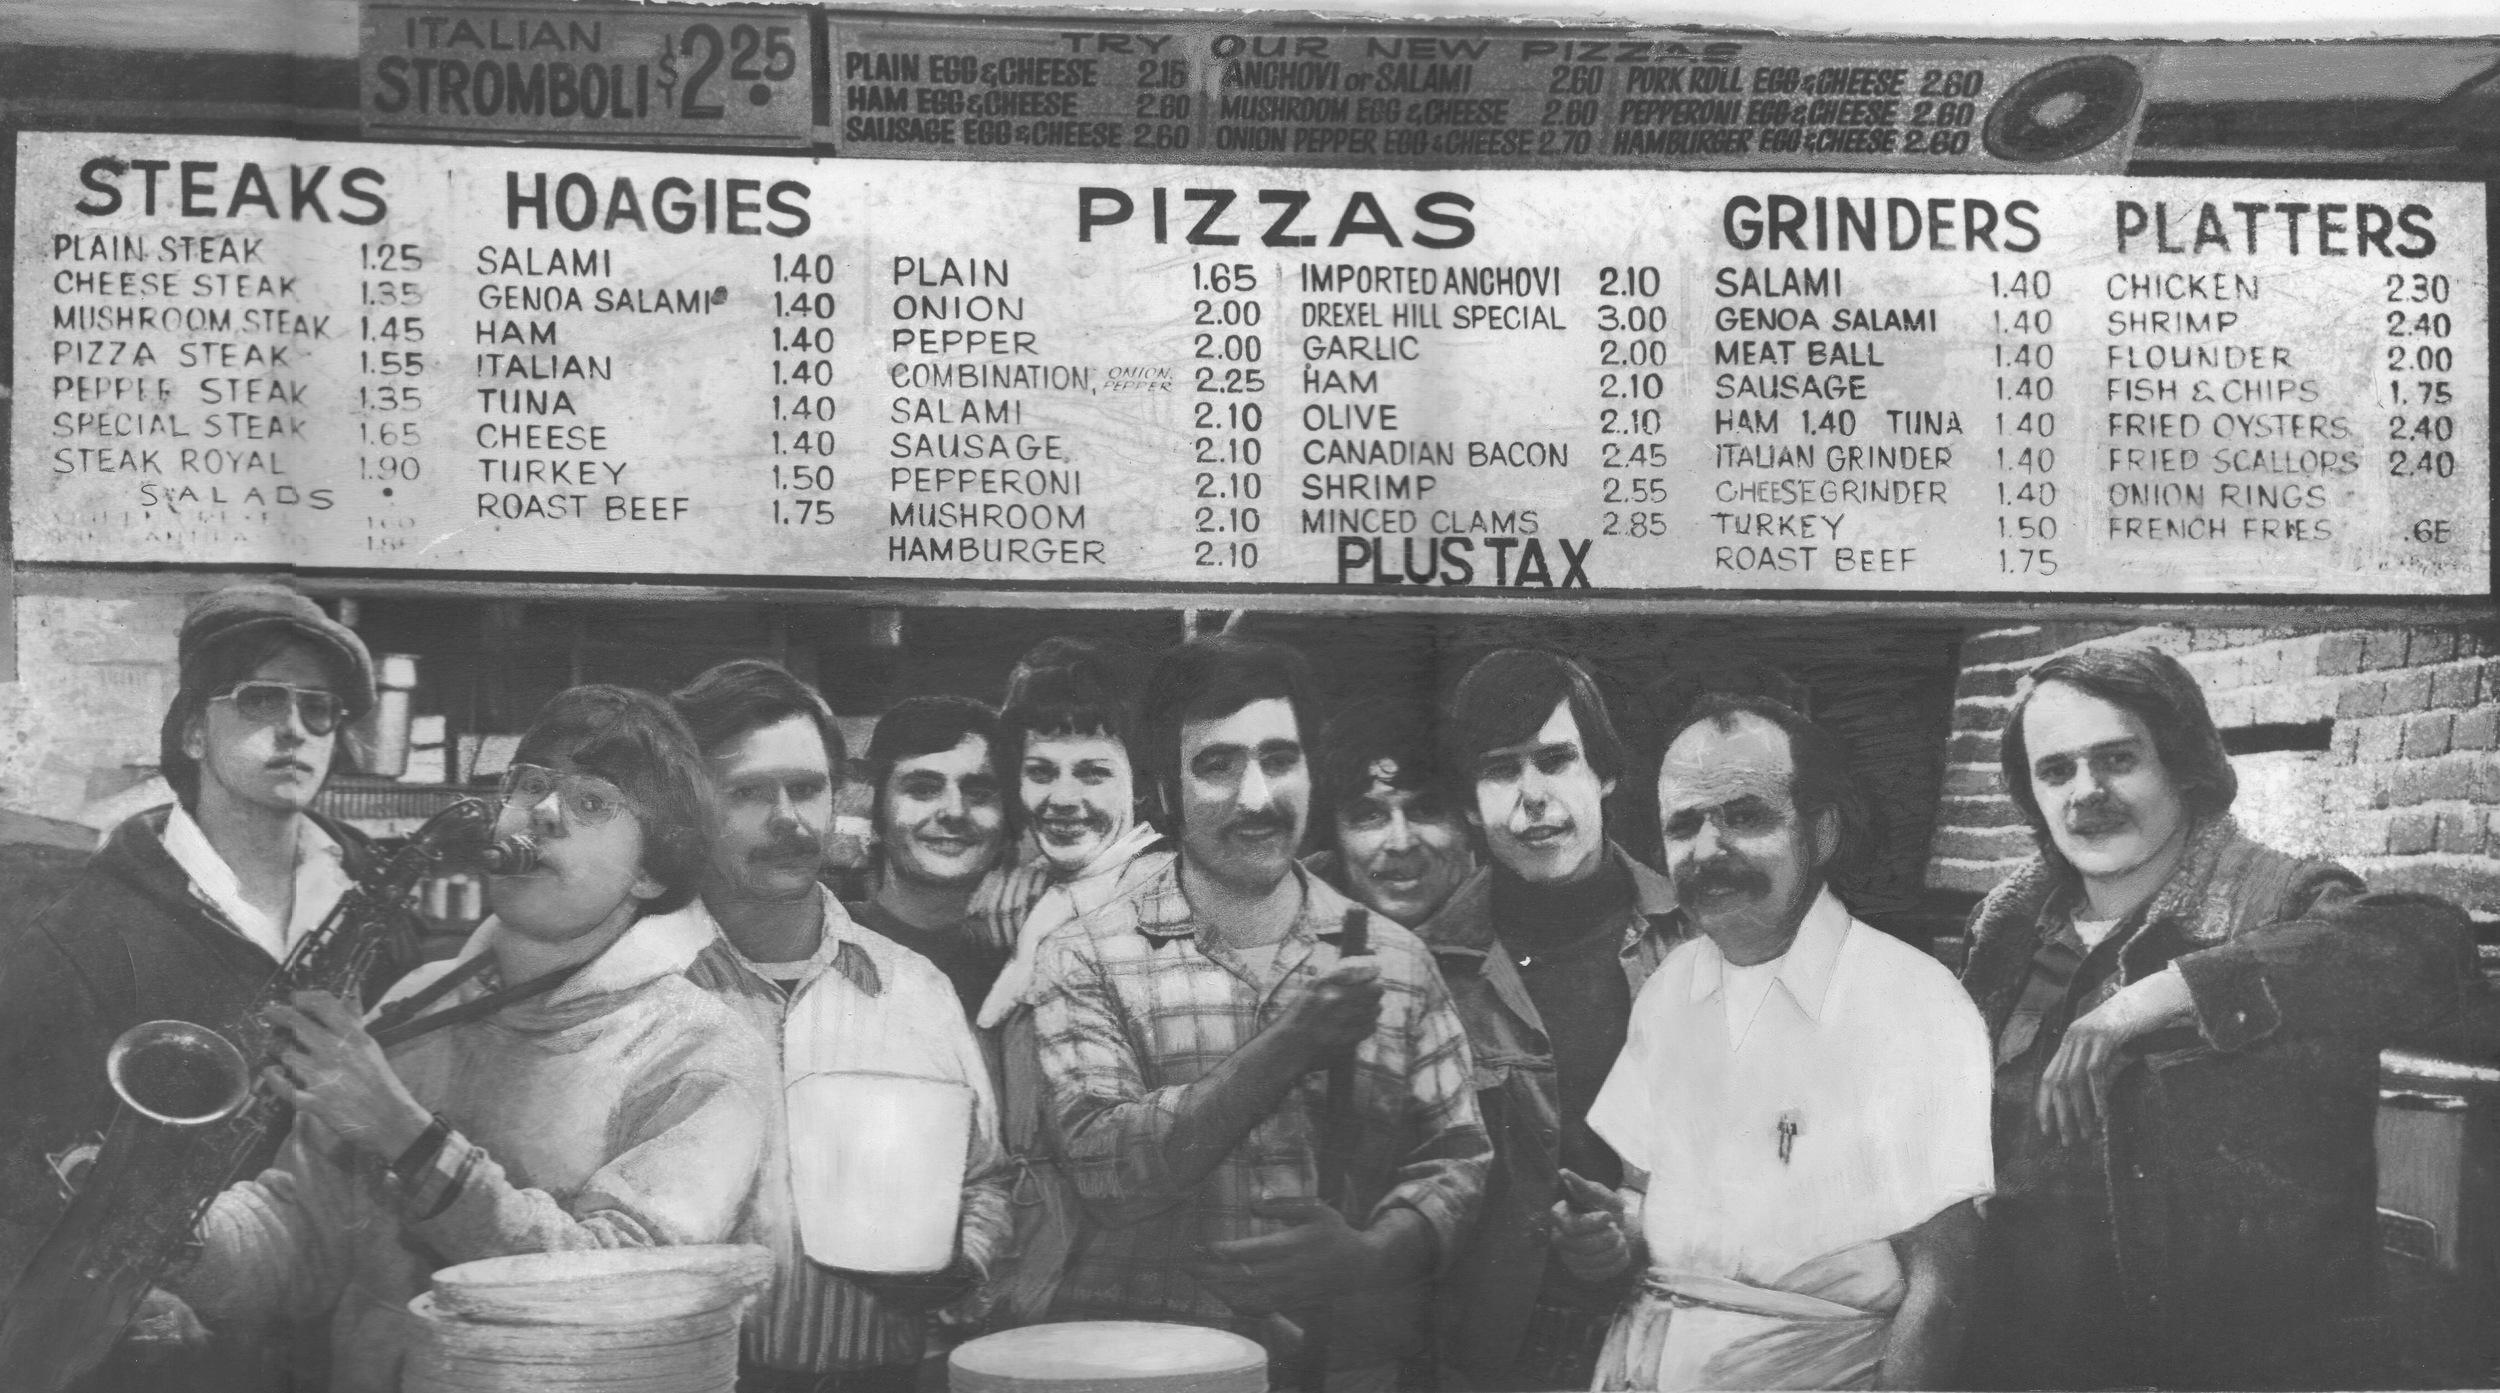 Drexel Hill Style Pizza - circa 1976